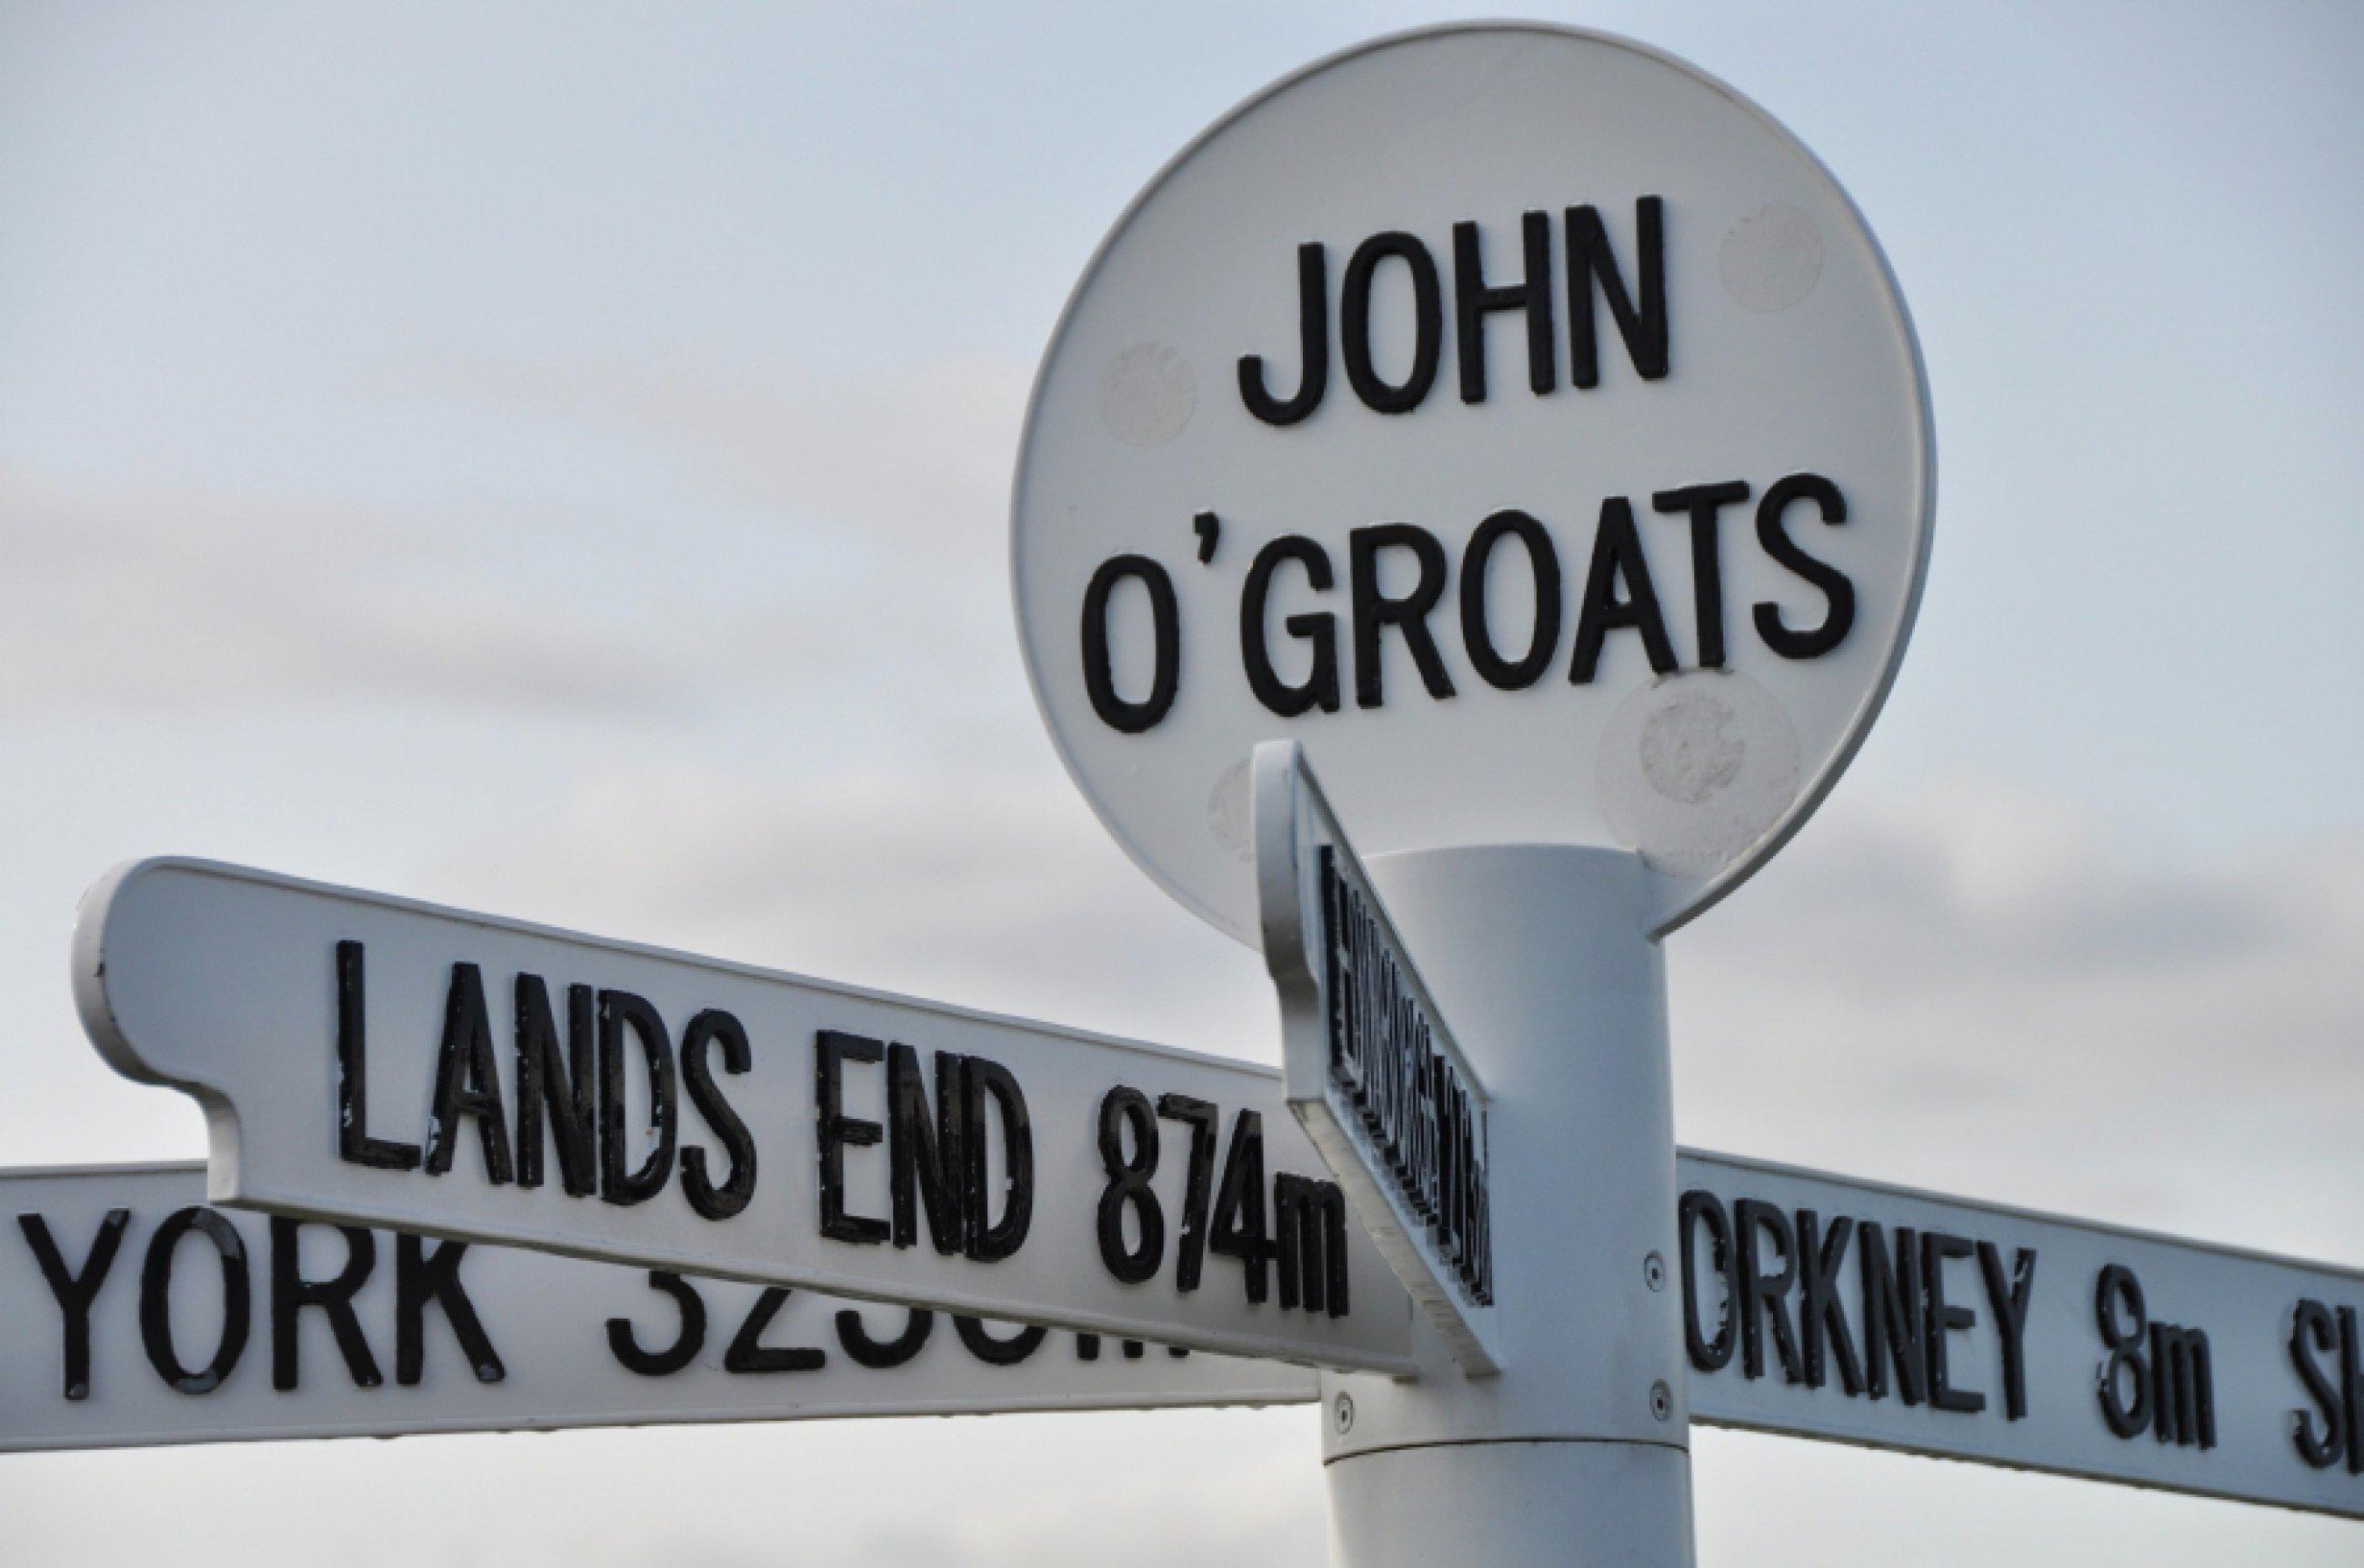 https://bubo.sk/uploads/galleries/5046/john-o-groats-skotsky-koniec-sveta-odkial-je-do-londyna-1100km.jpg